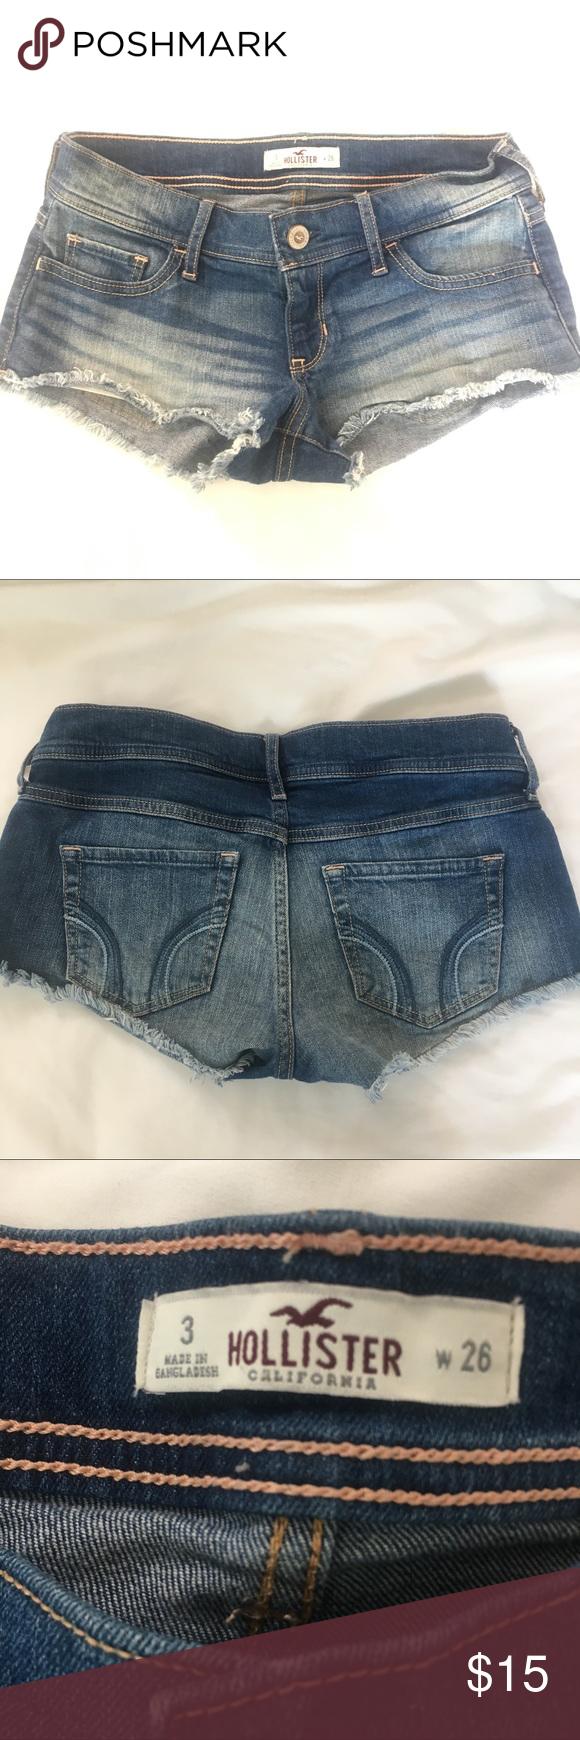 Size 31 Clothing, Shoes, Accessories Buffalo David Bitton White Denim Cut-off Shorts